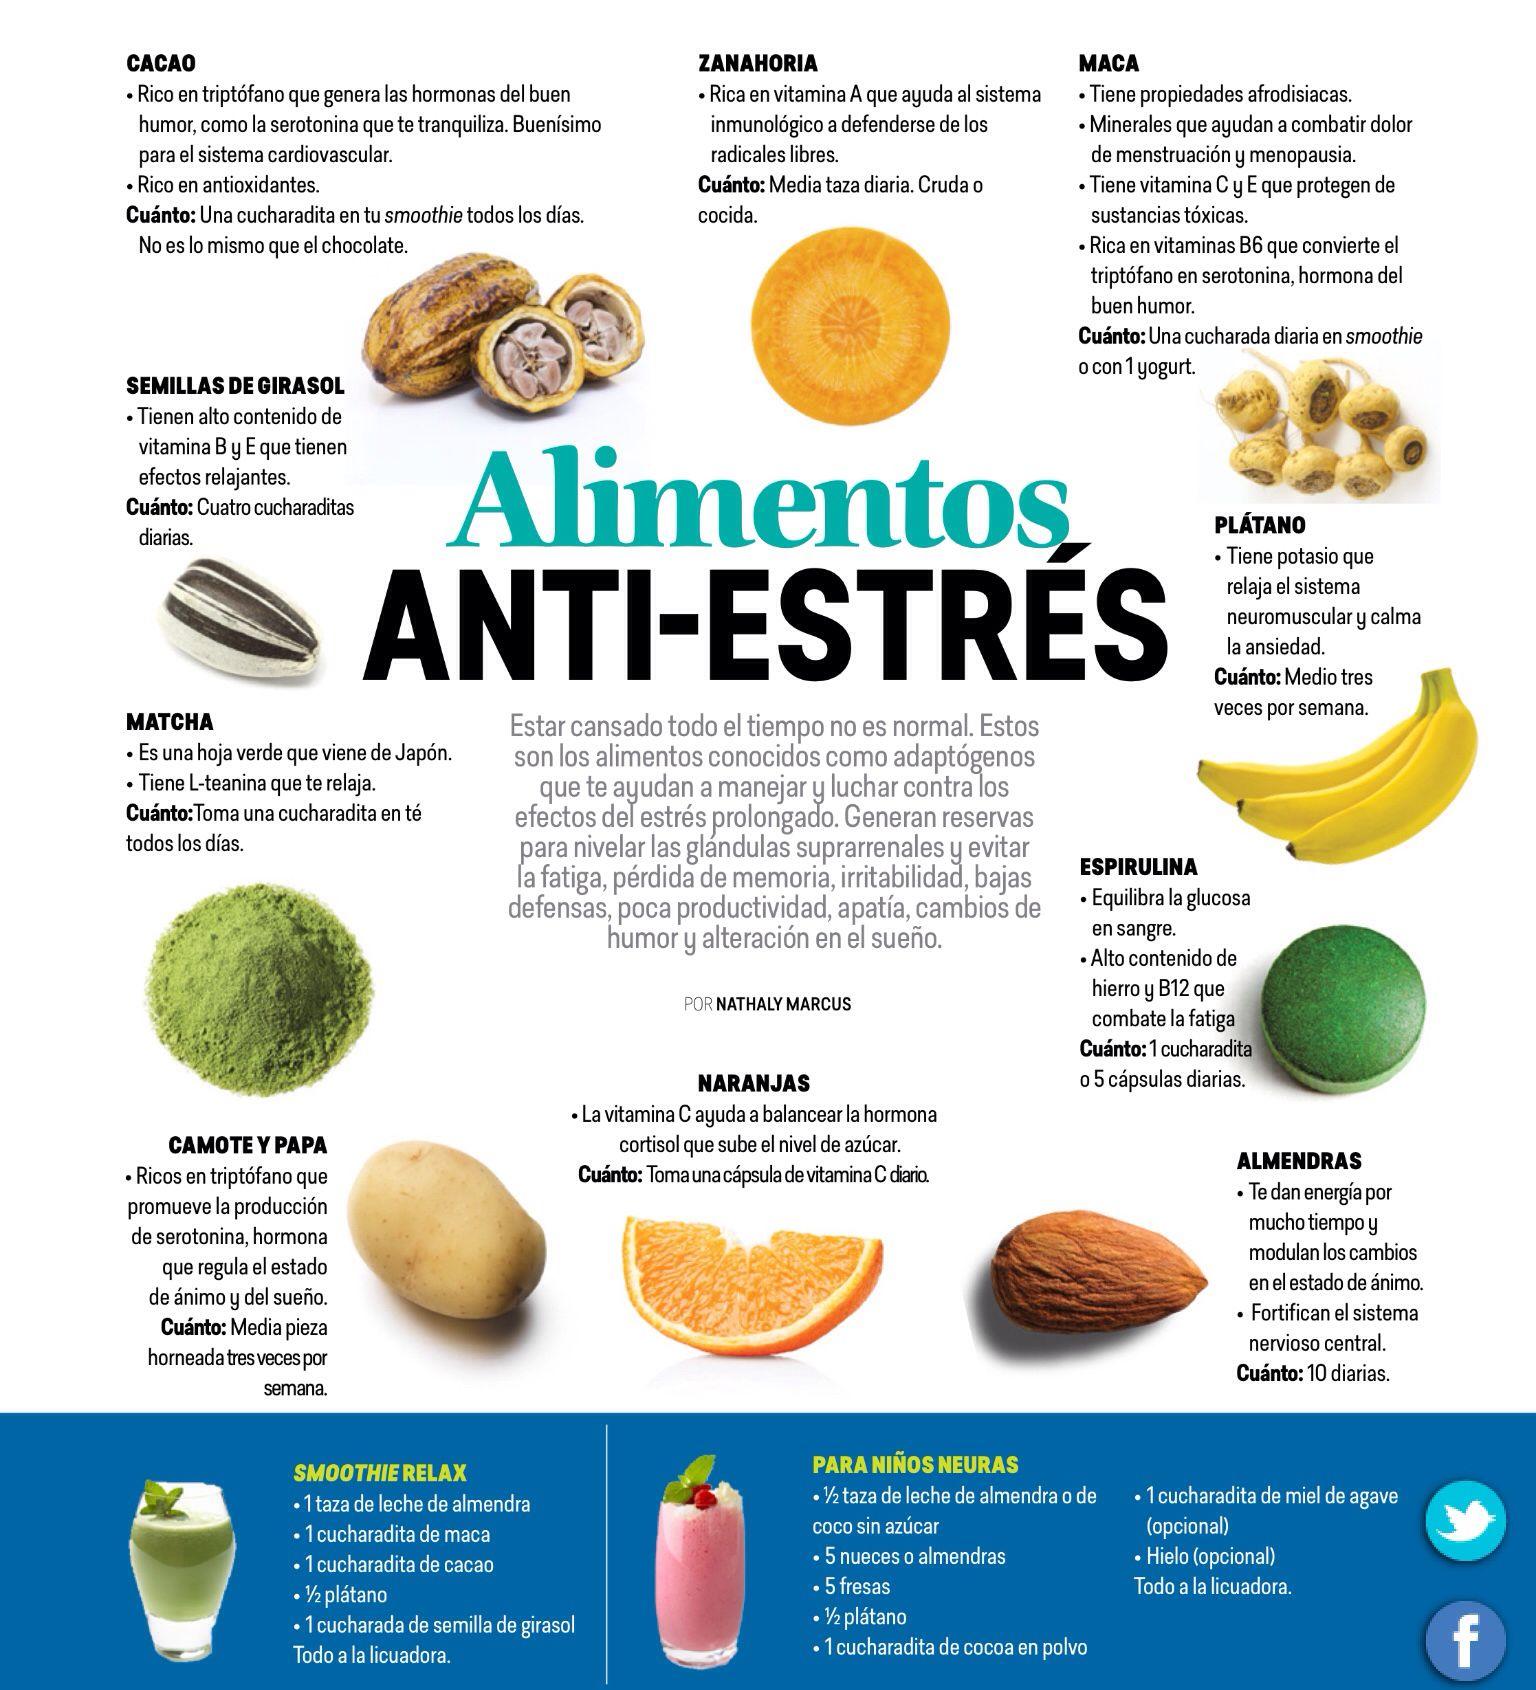 Alimentos anti estr s anti stresss pinterest for Anti projection cuisine